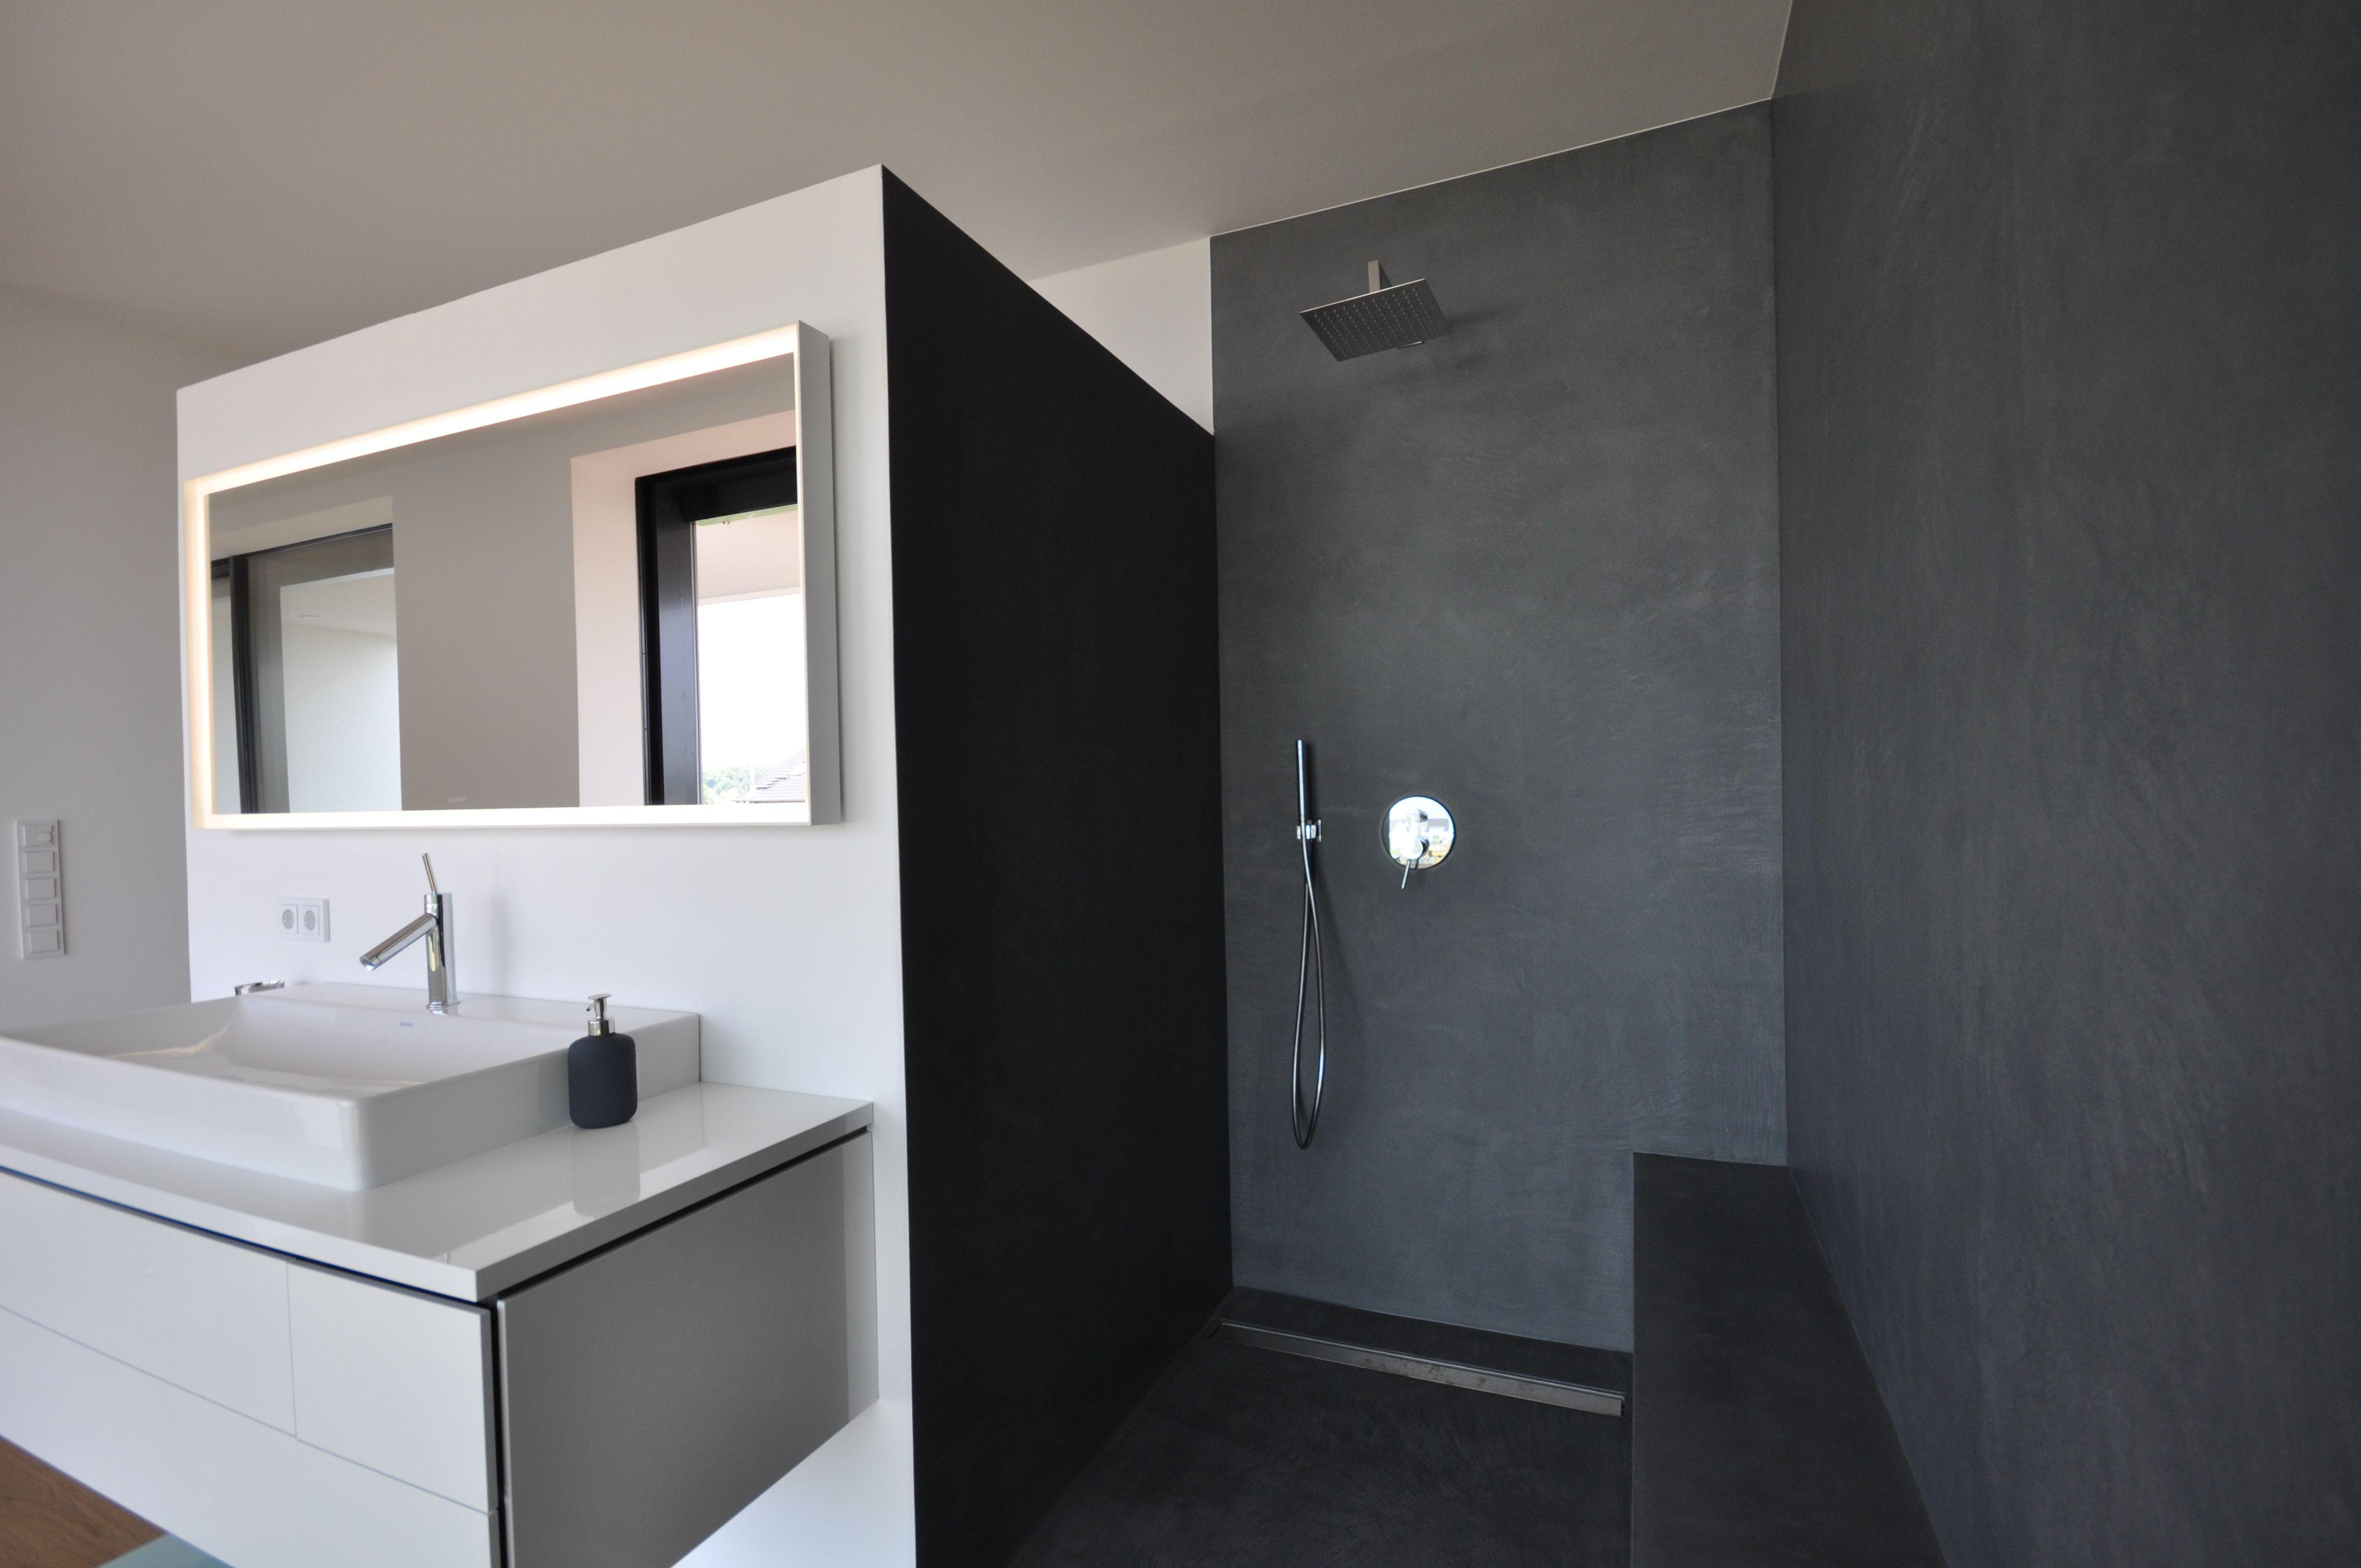 Designbad • Kalk-Marmor-Putz • Dusche • Black • fugenlos ...